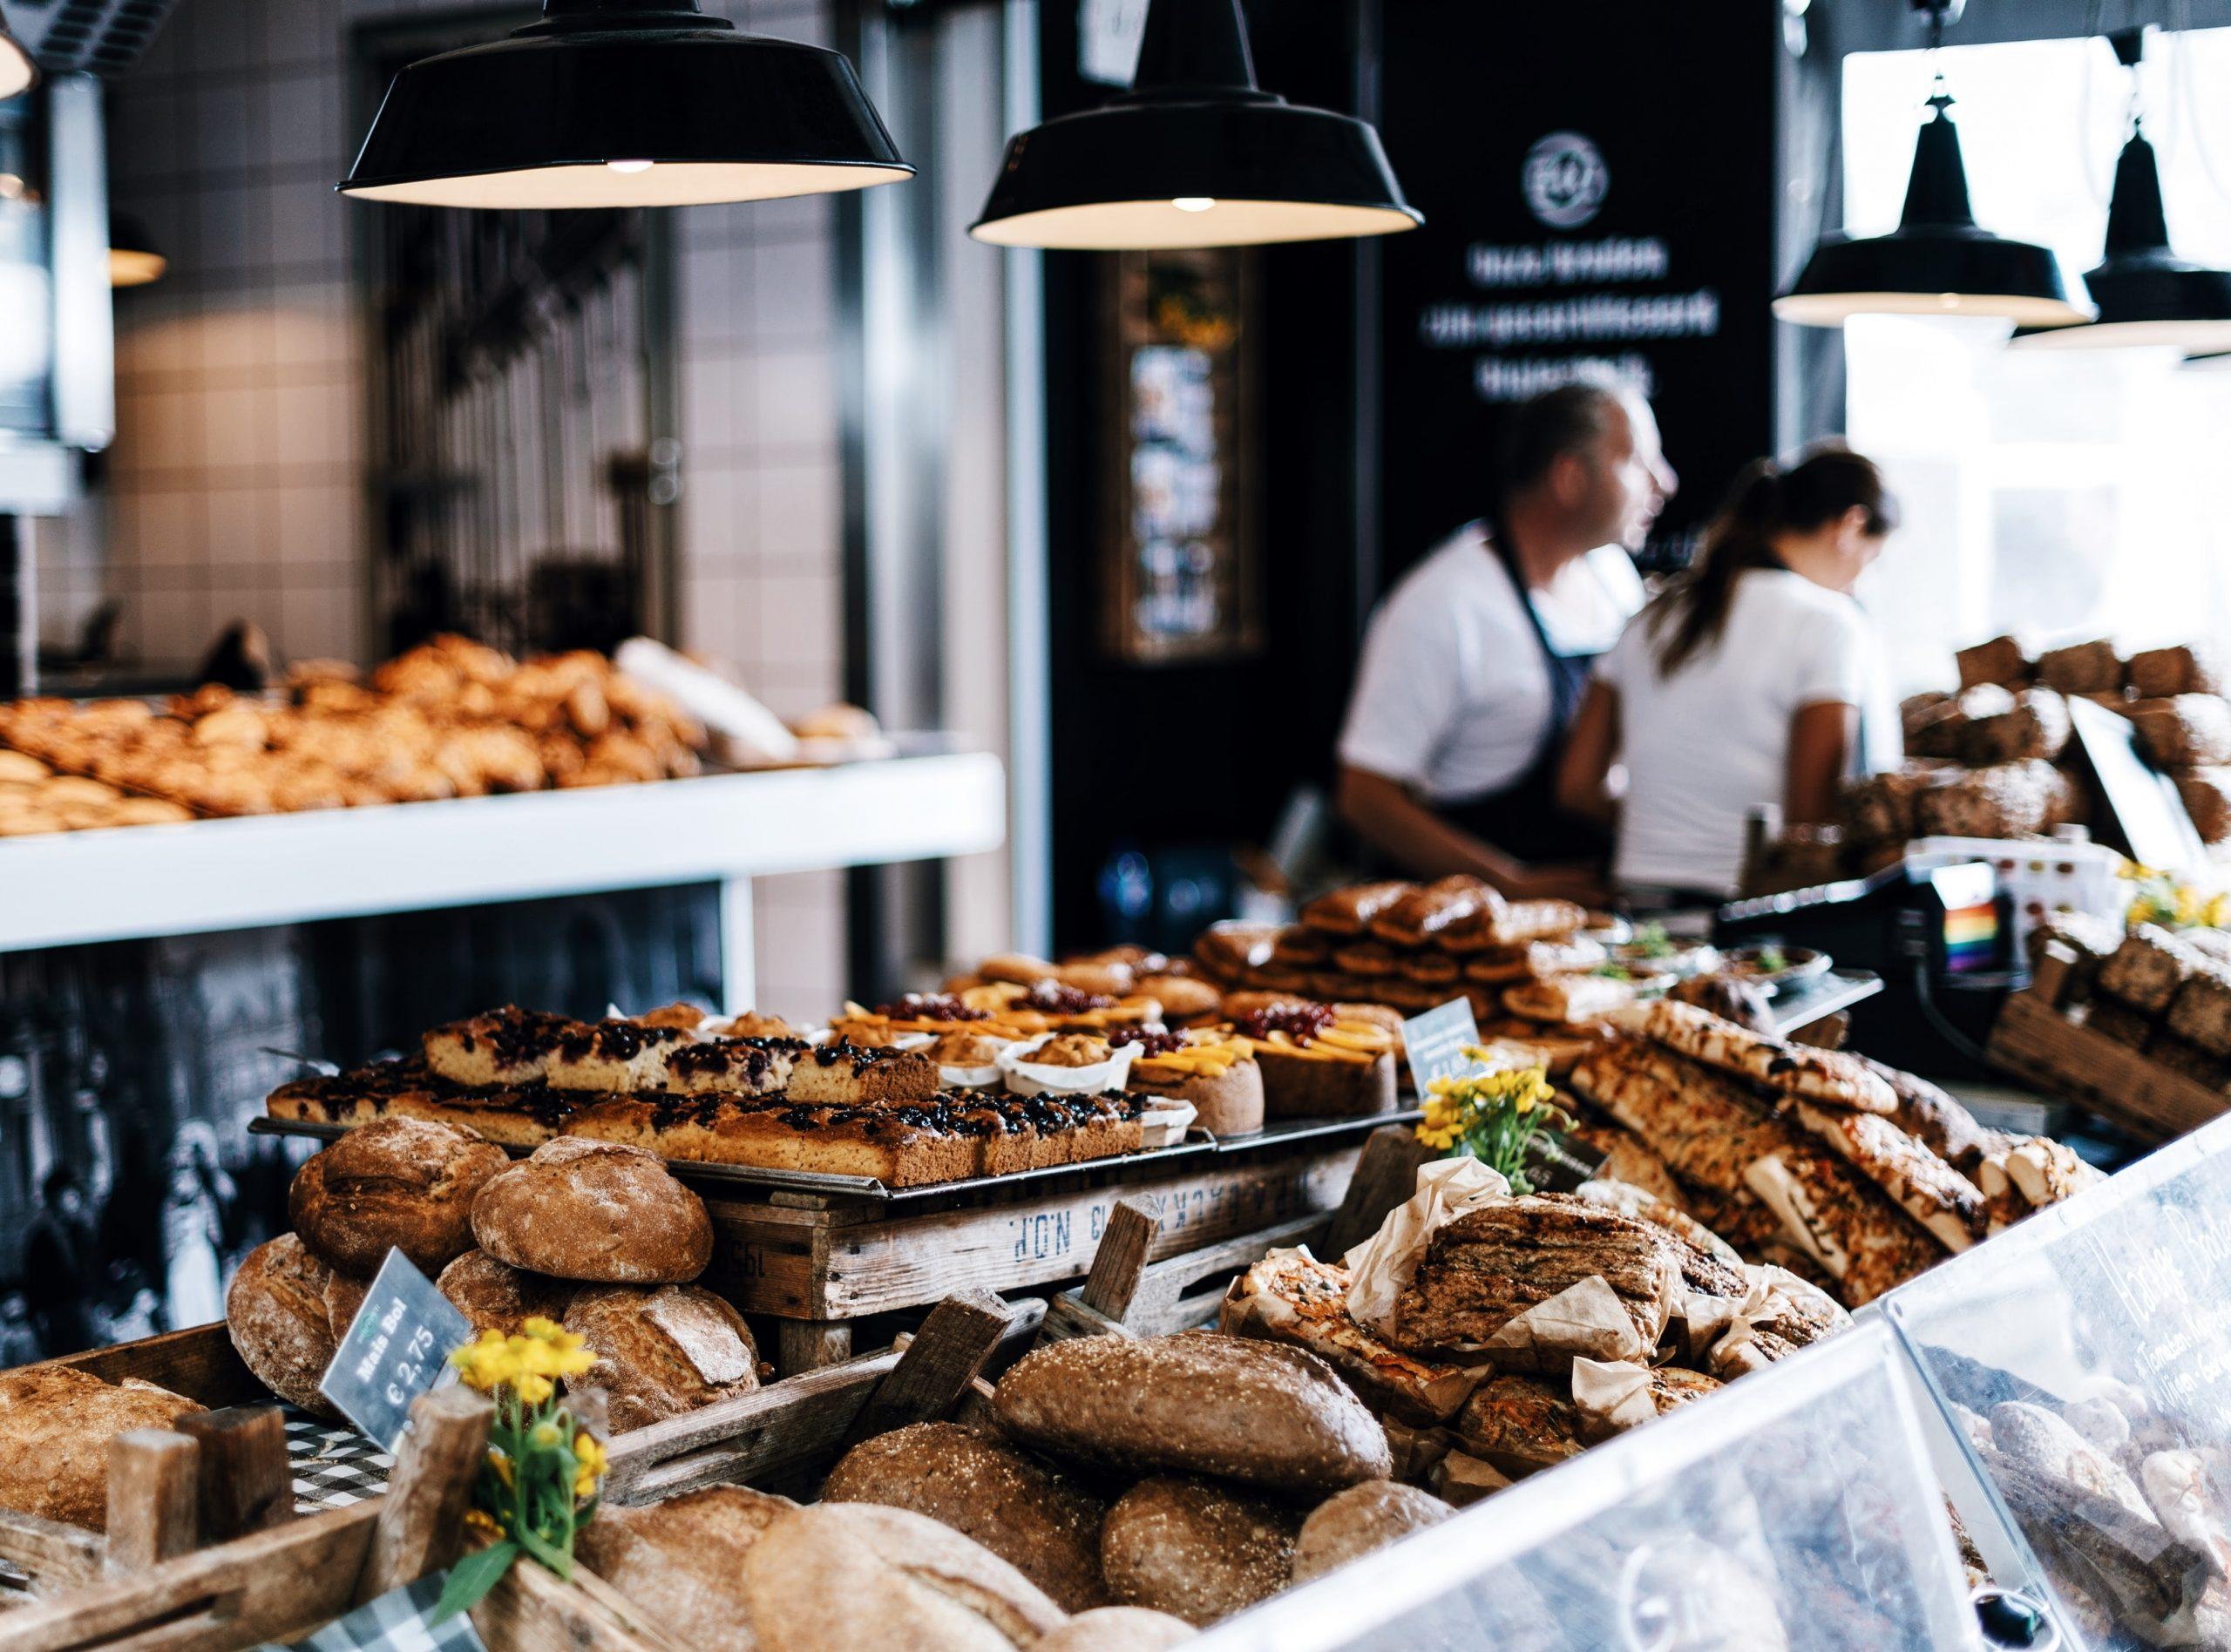 Boulangerie / Pâtisserie/ Chocolaterie